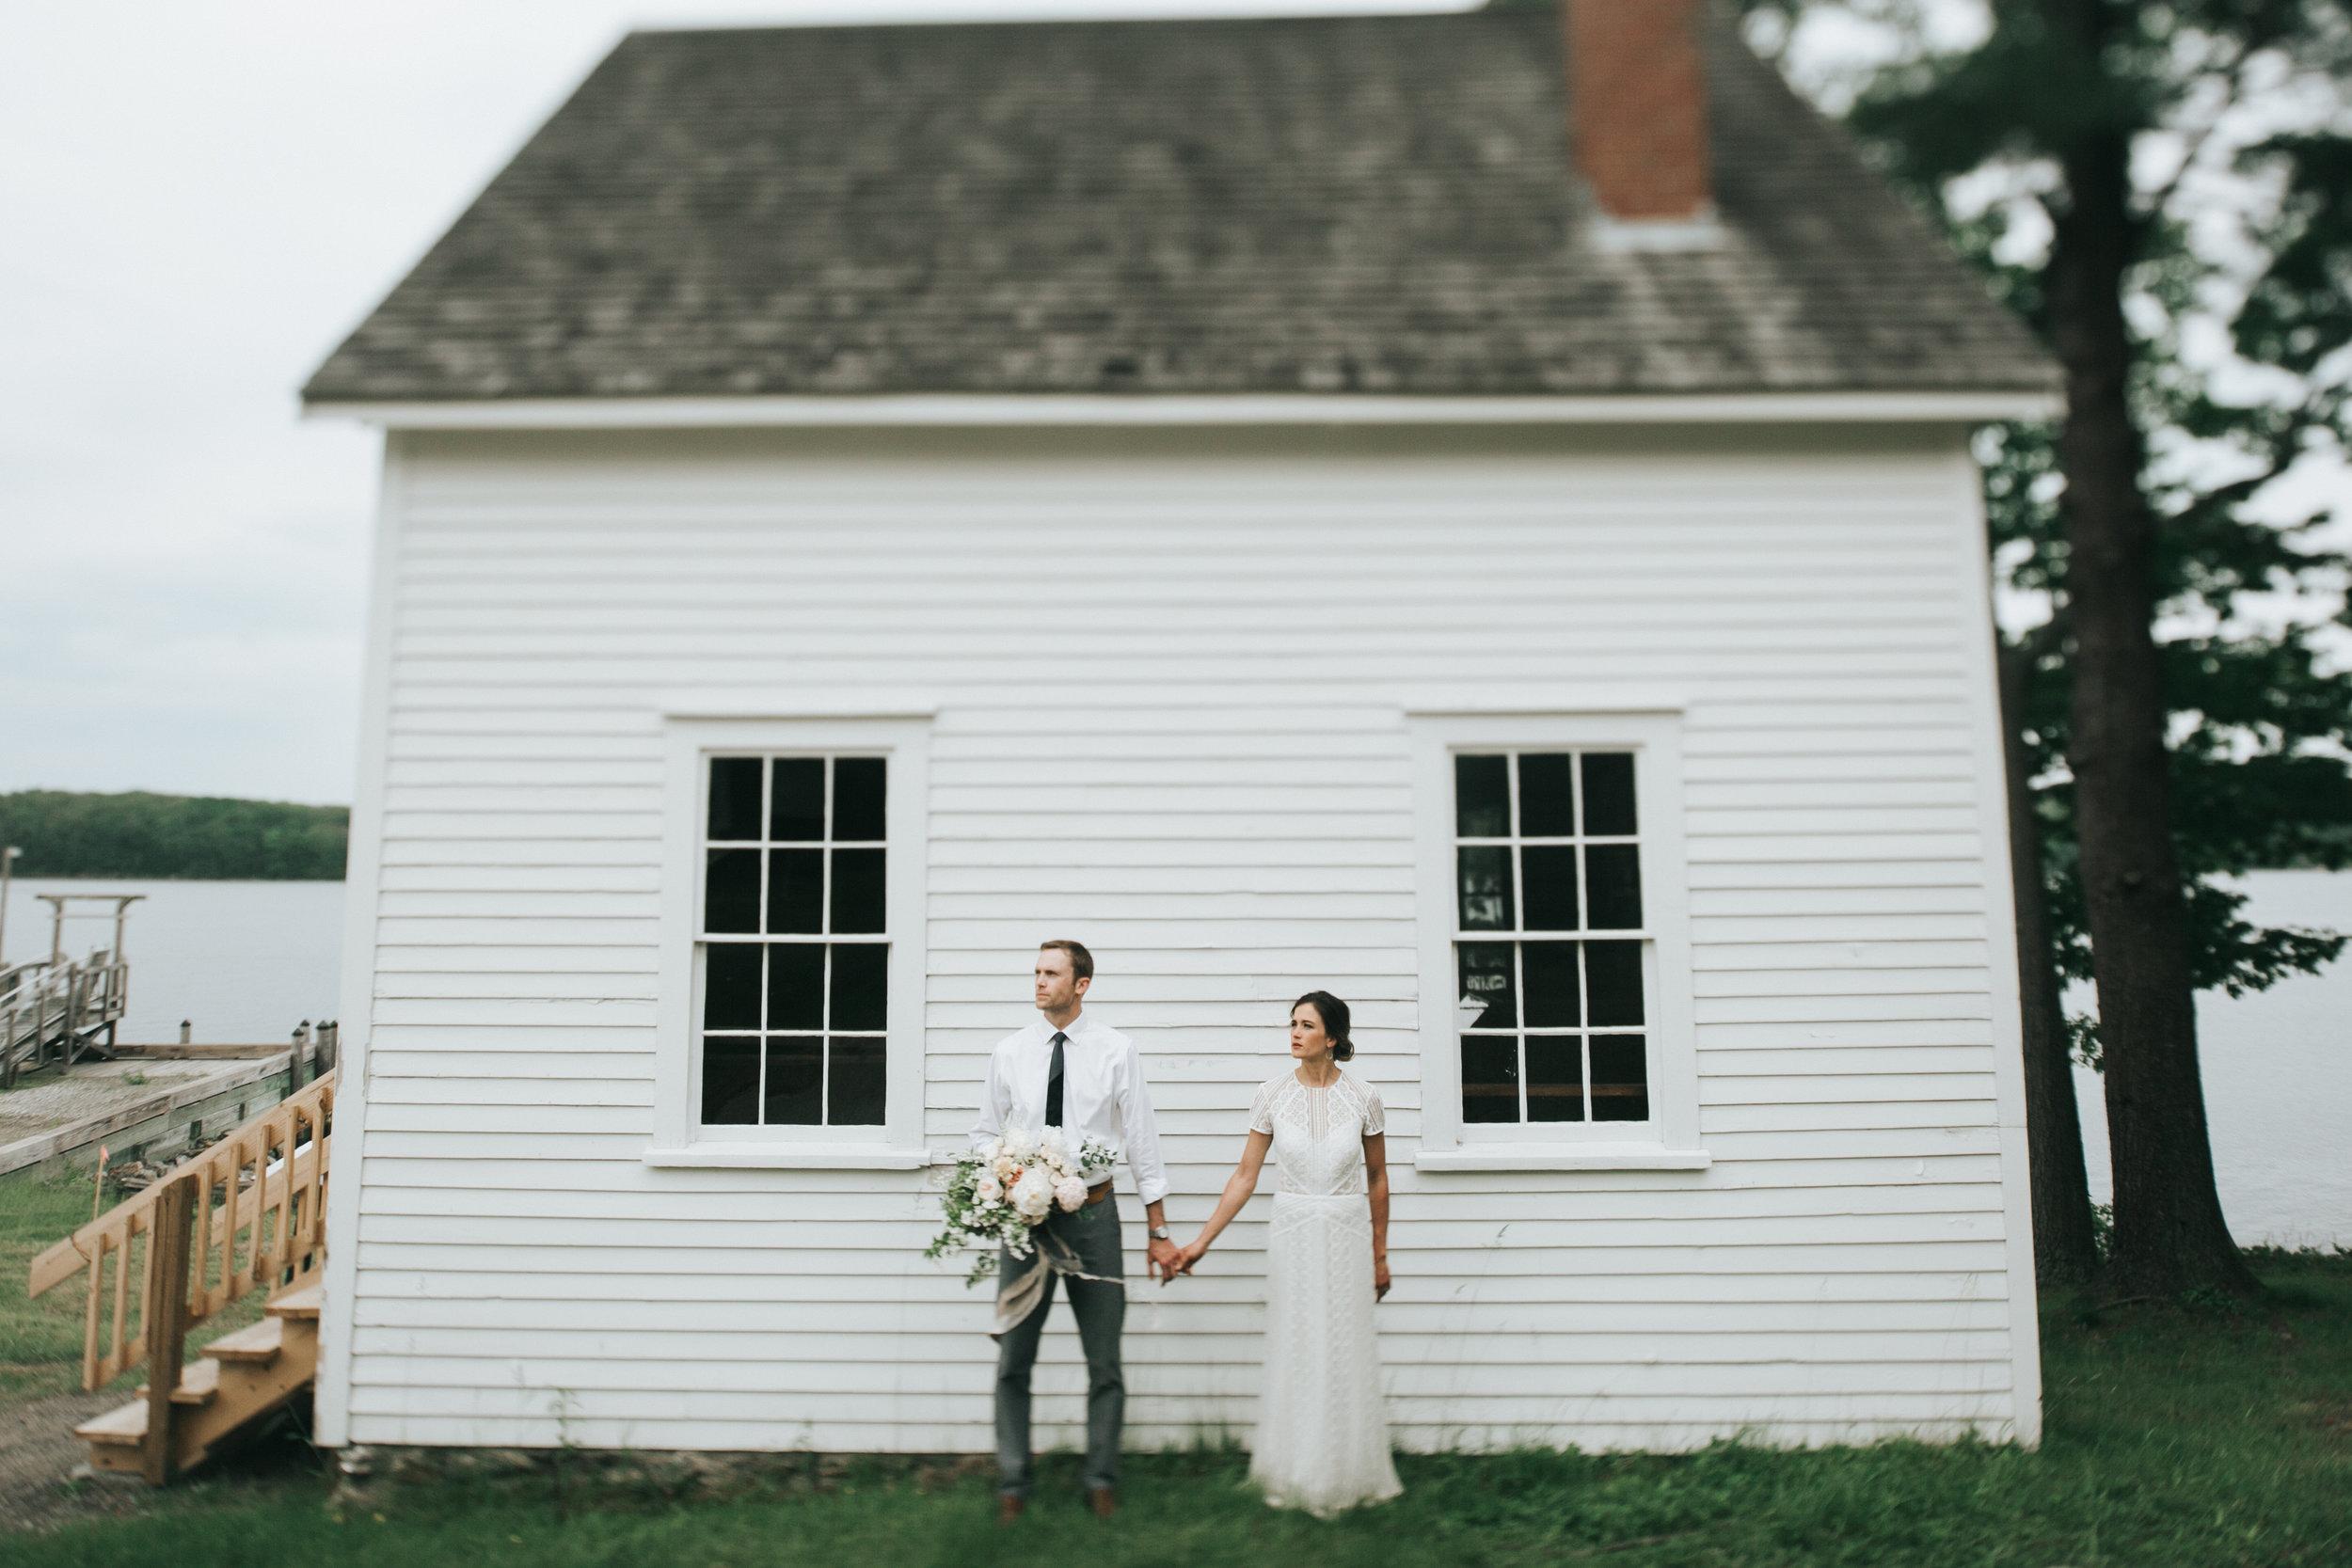 Watershed-Floral-Maine-Maritime-Wedding-Bridal-Bouquet-Centerpieces-0199.jpg